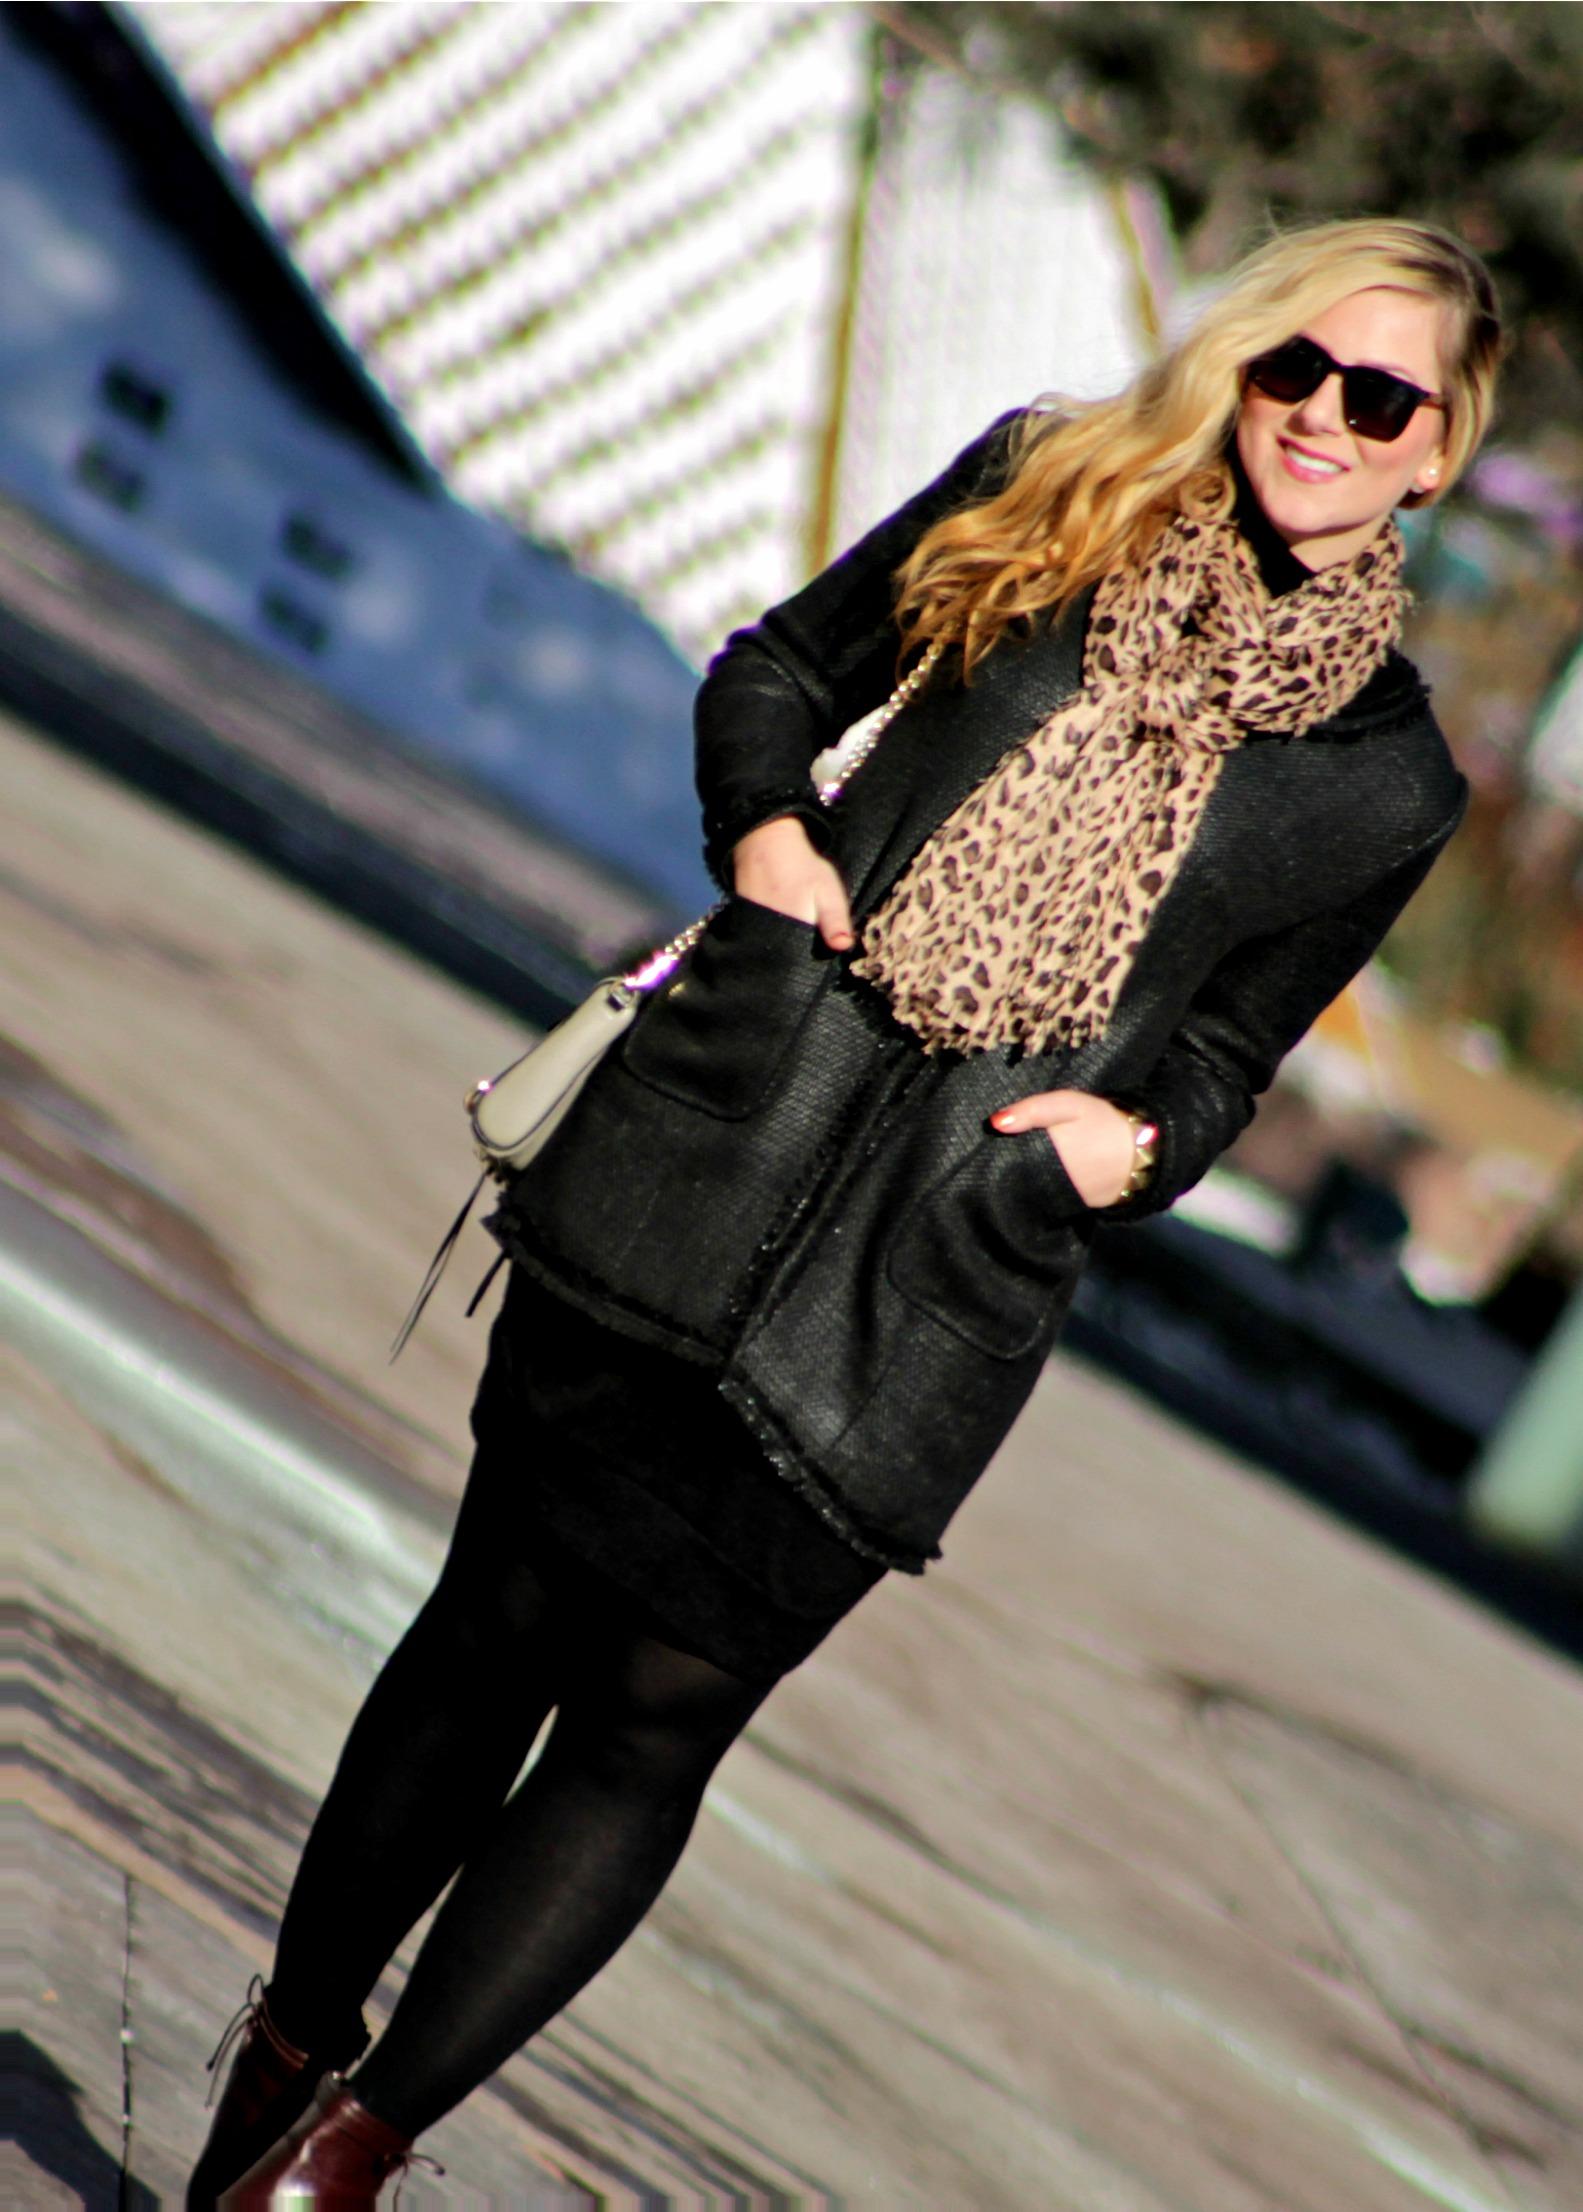 Black tweed jacket, leopard scarf, sweater dress, booties